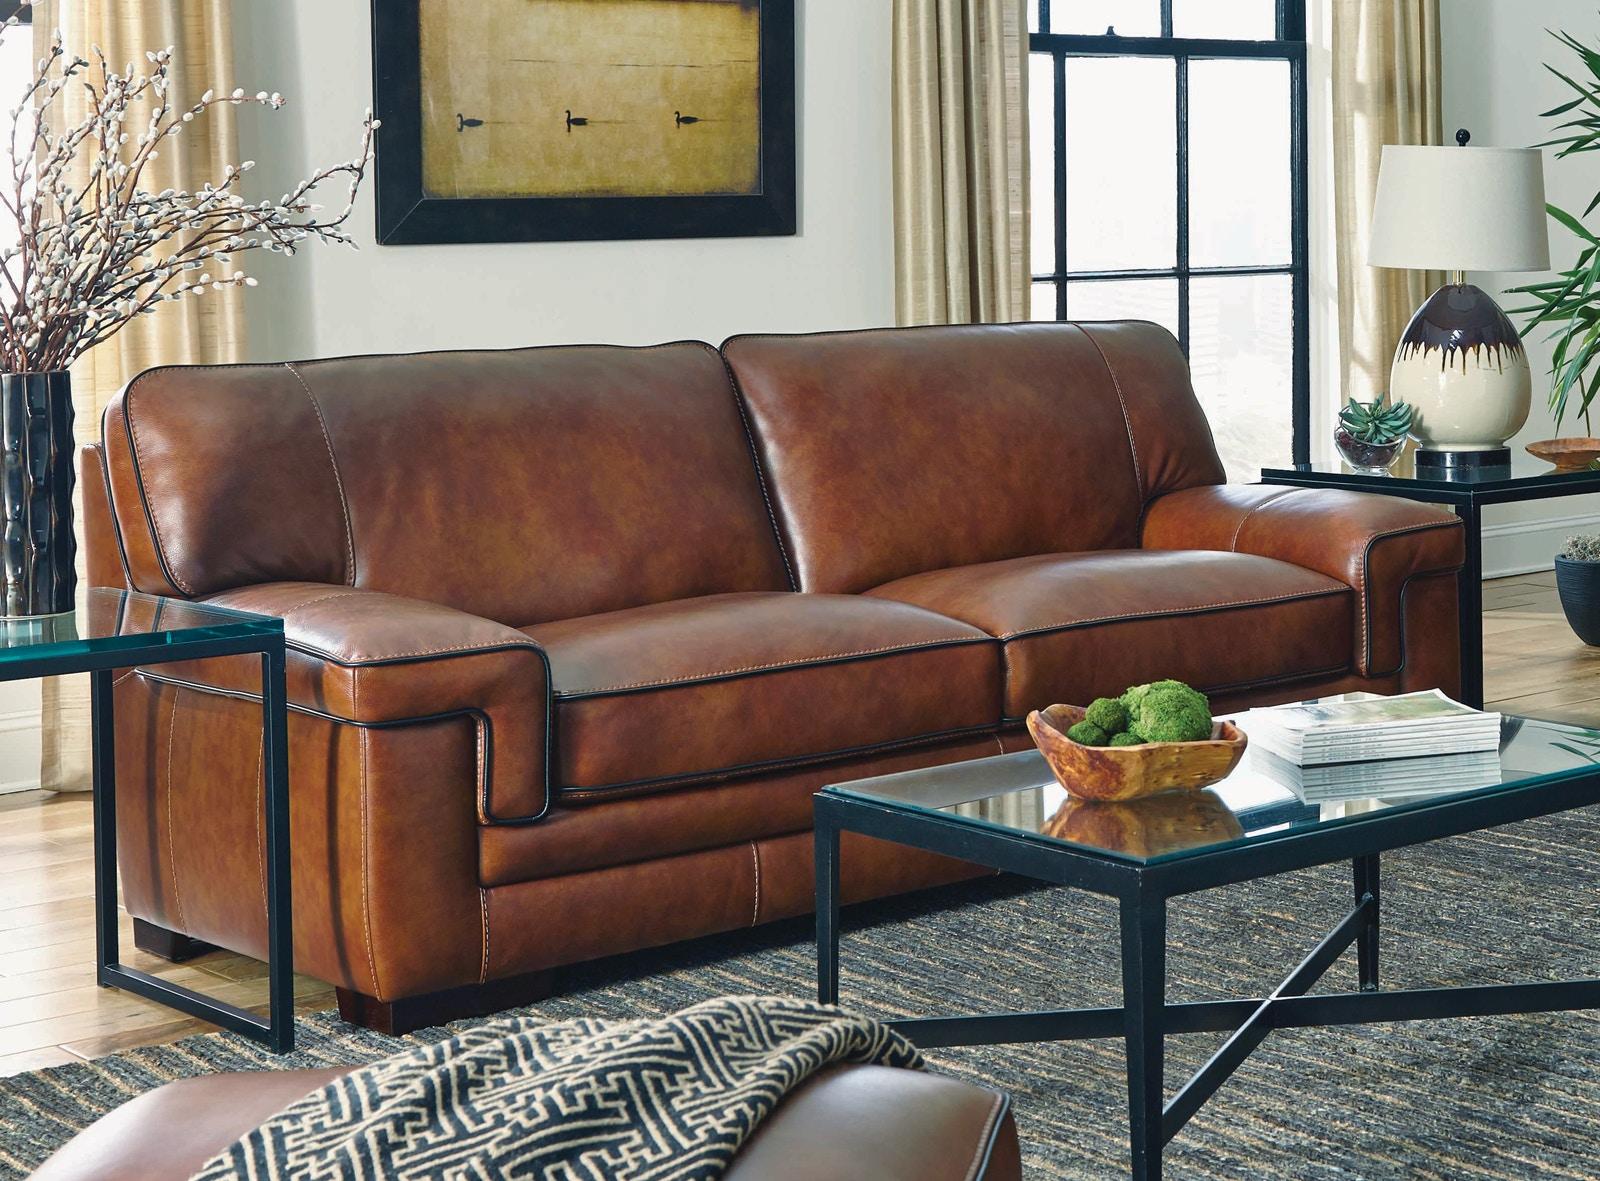 simon li chestnut leather sofa - Simon Li Furniture